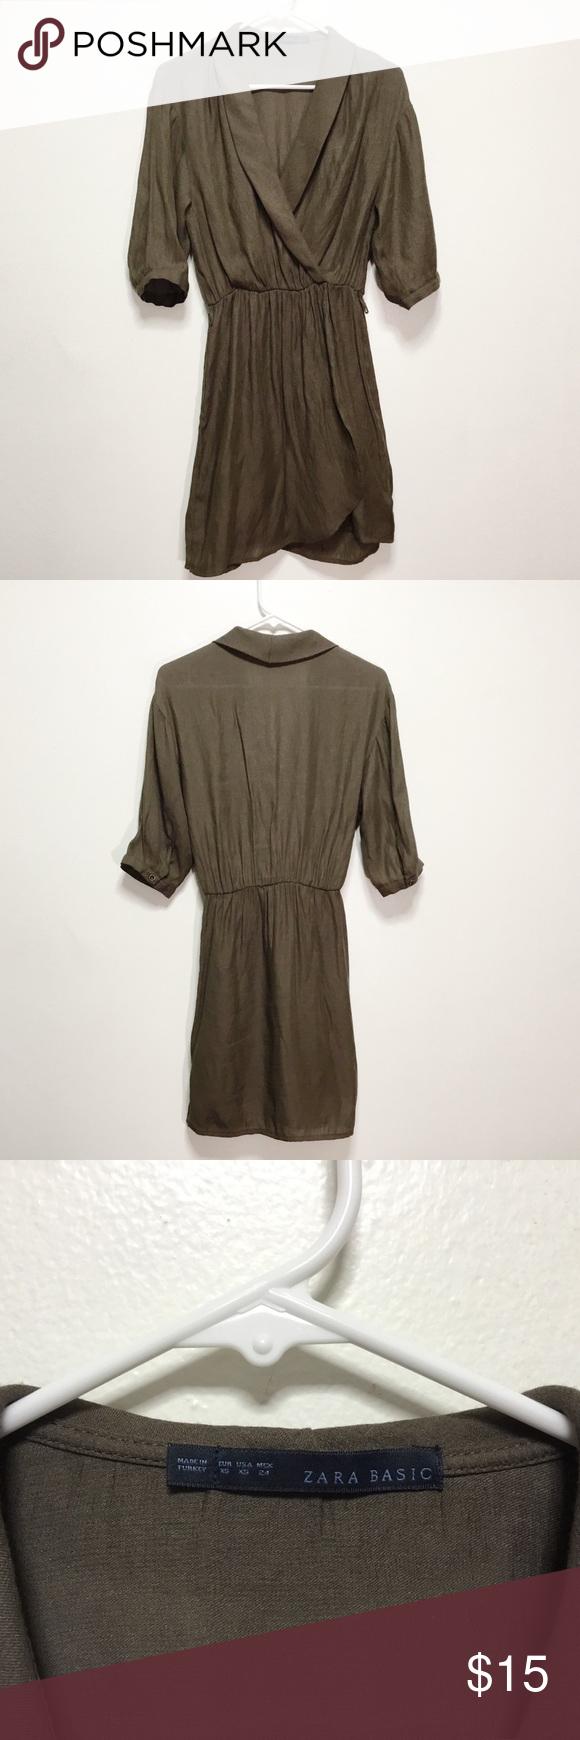 9f6f4b0aeb Zara Linen Dress Green brown linen dress. No belt but loops still on dress